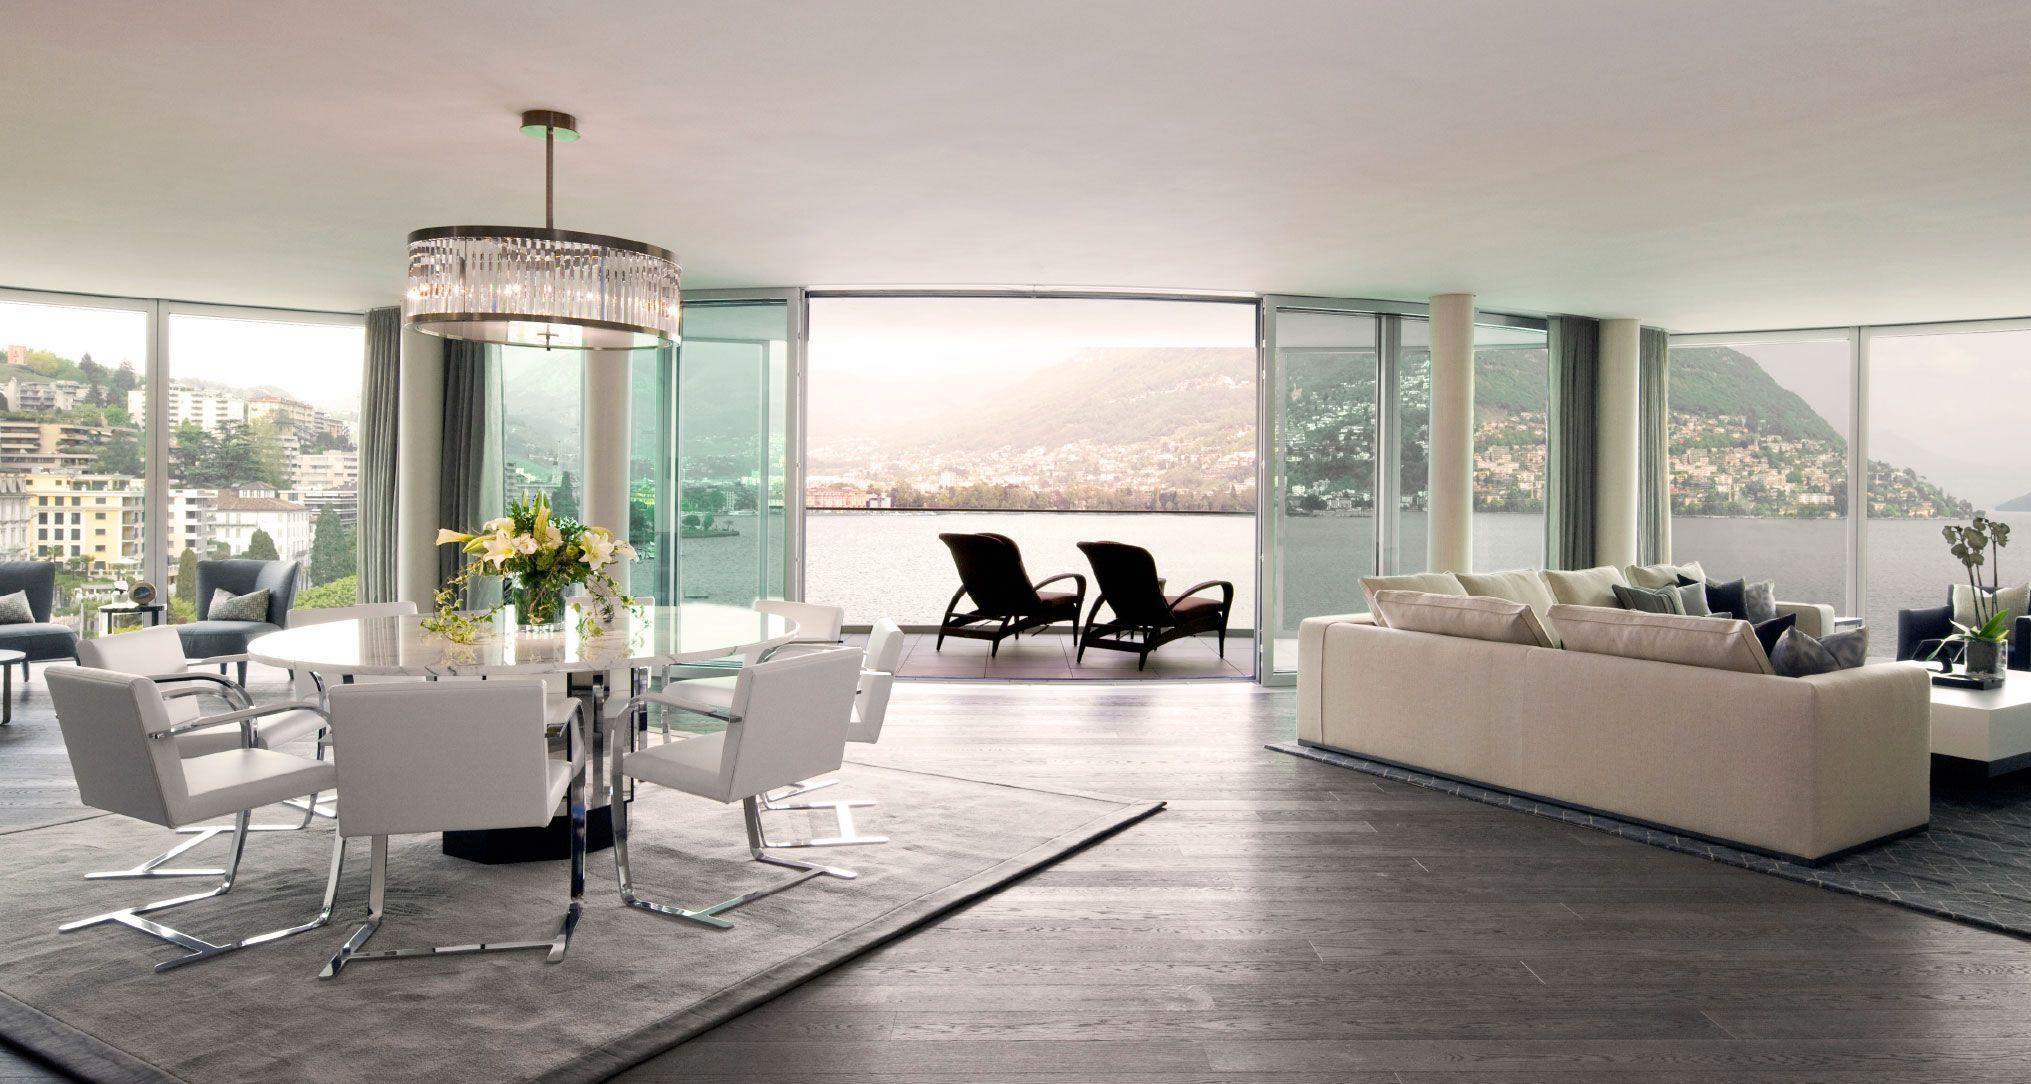 Home interior design gurgaon stunning lakeside luxury apartment by finchatton interior design